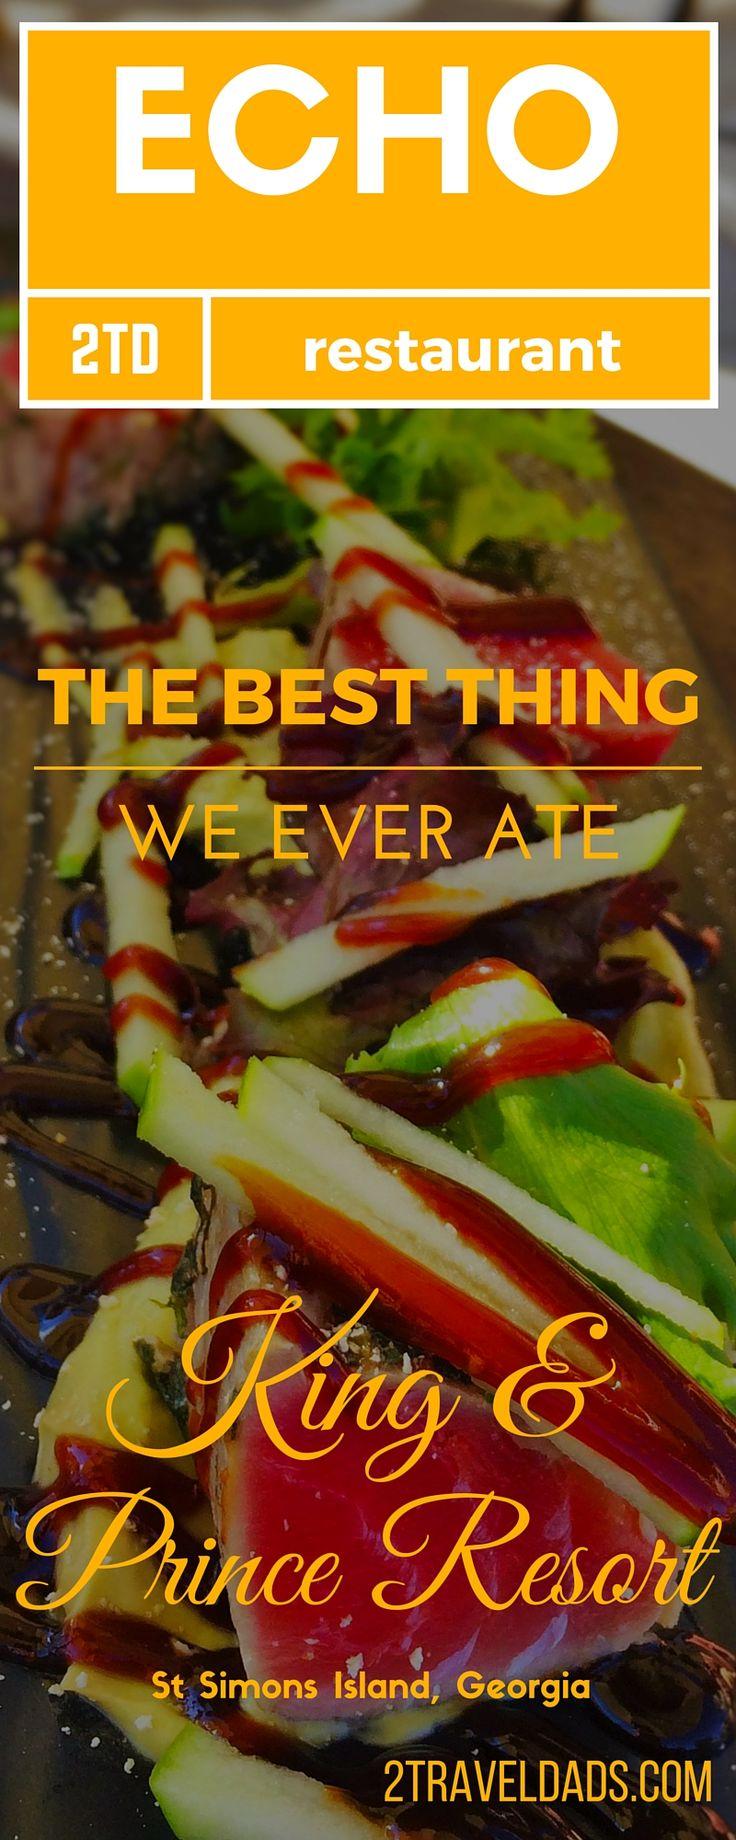 Food Blog Restaurant